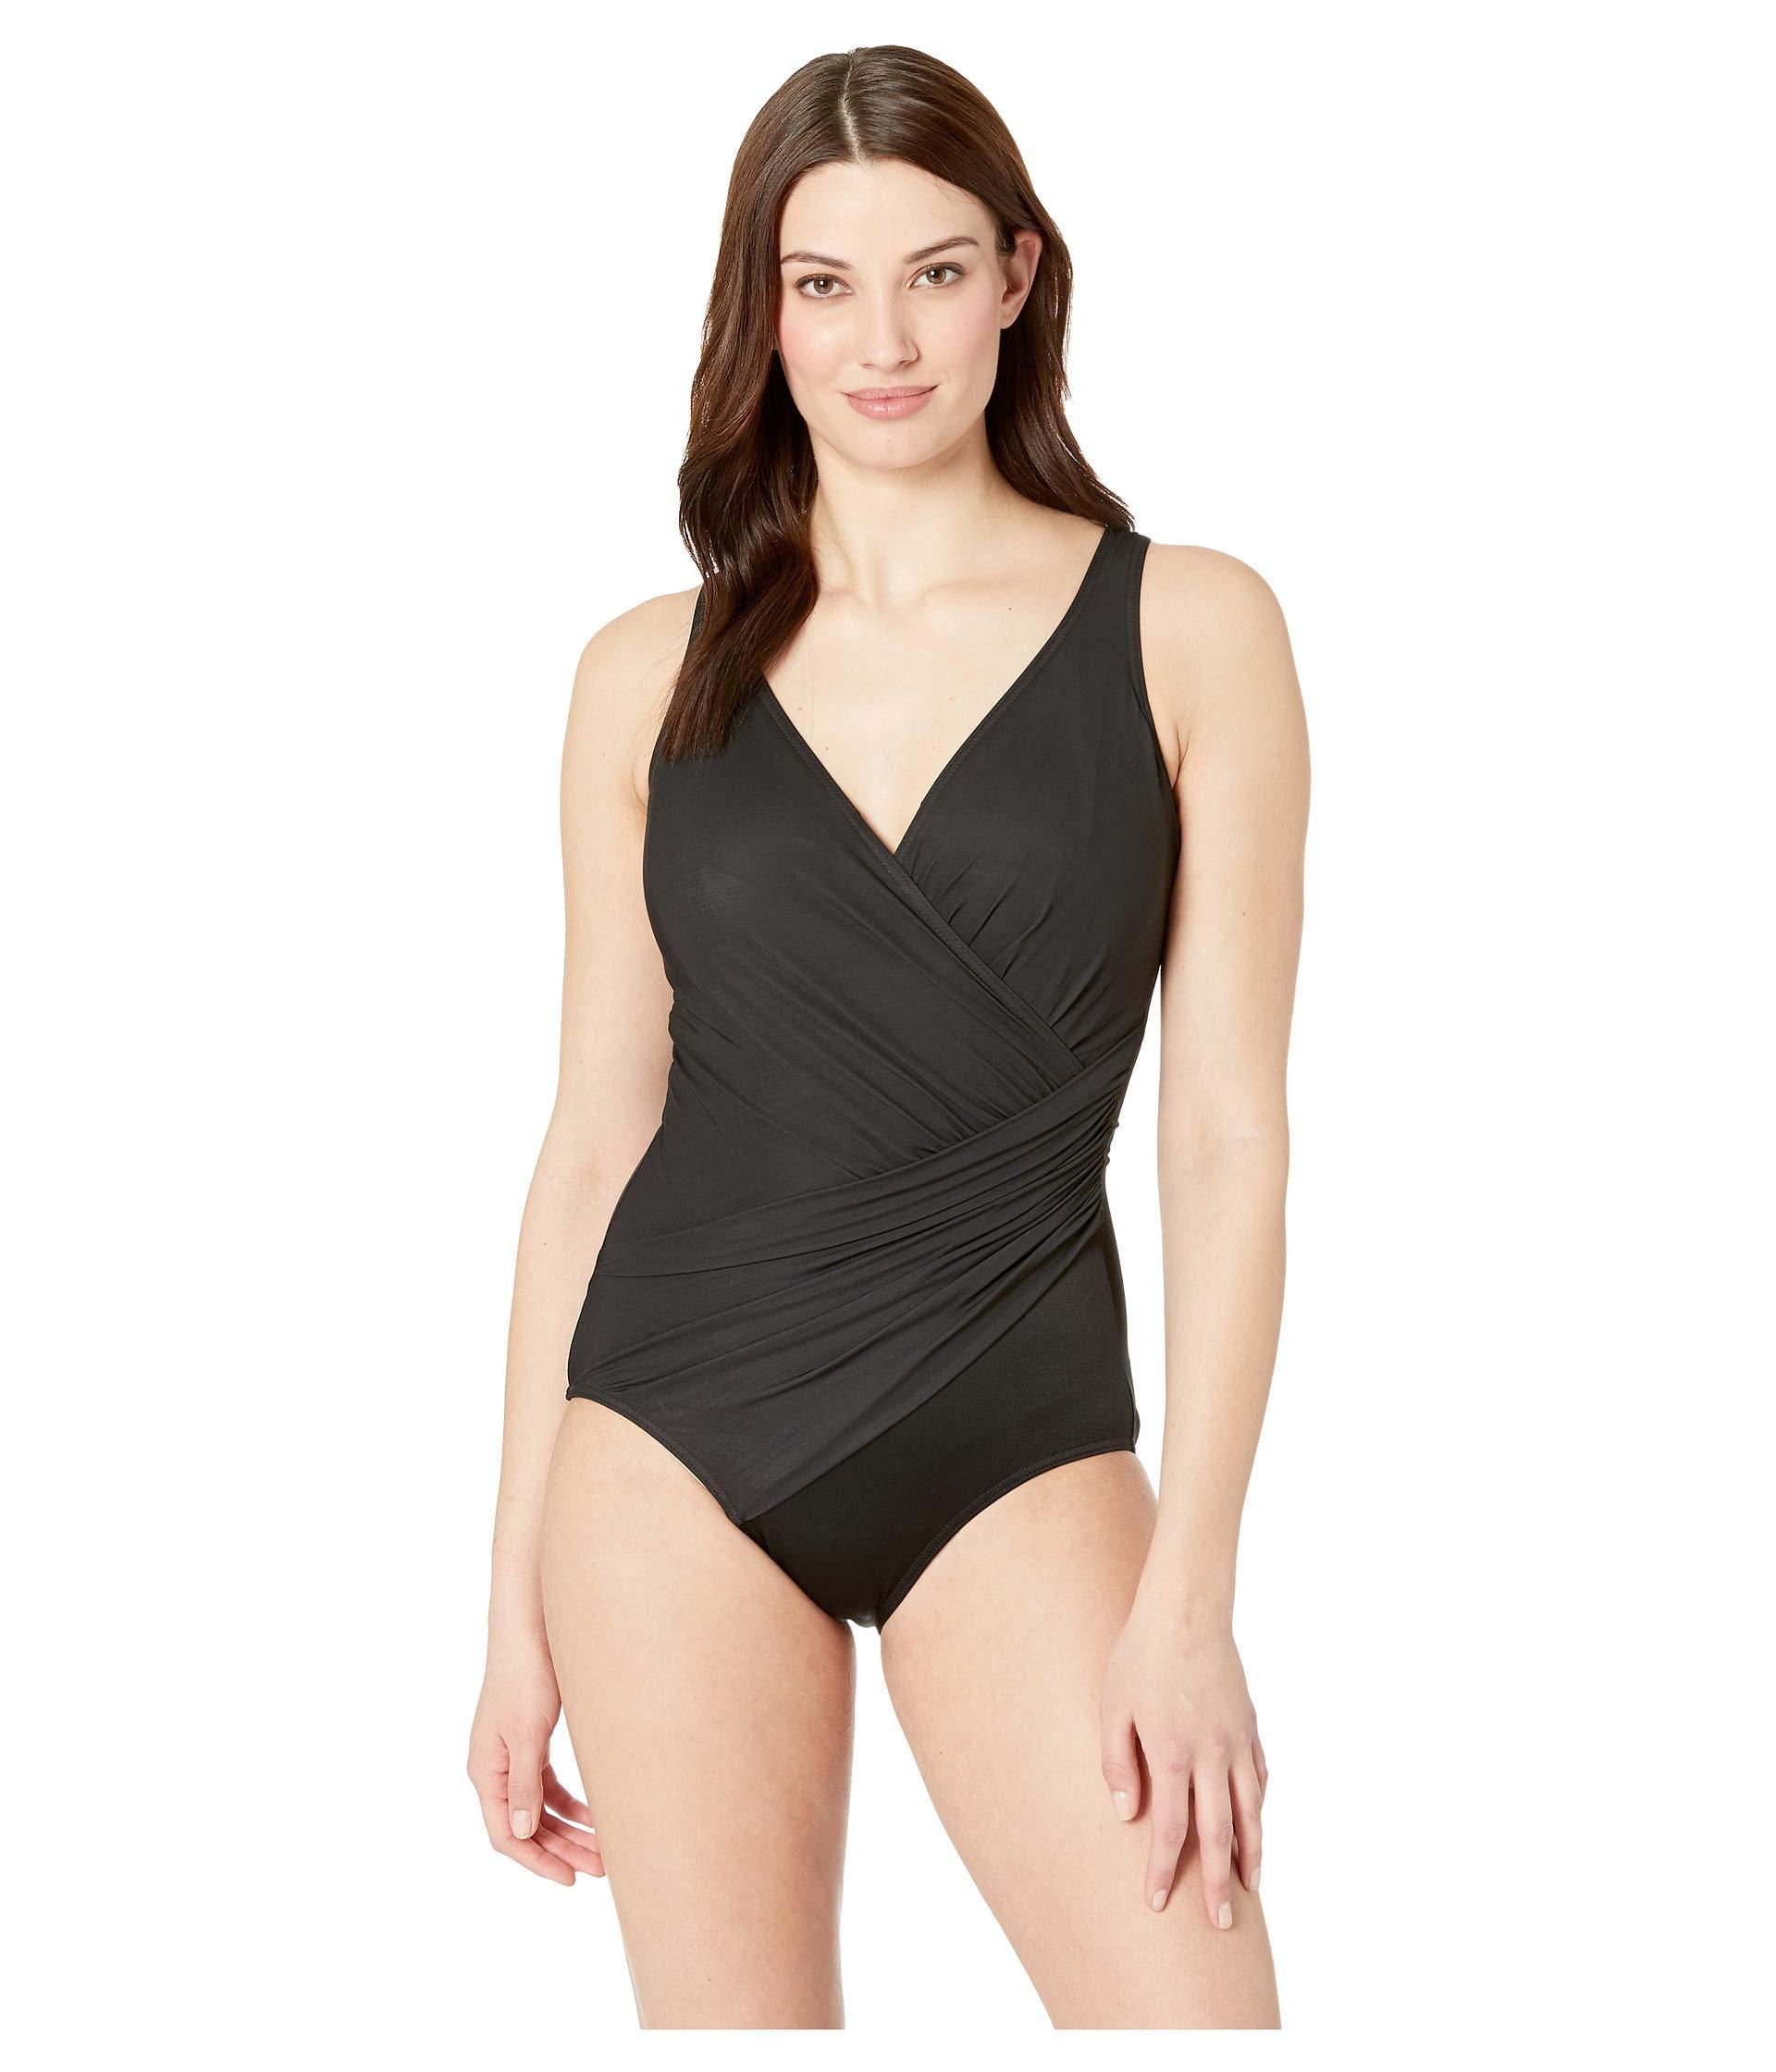 debc389ebcebd Lyst - Miraclesuit Solid Dd-cup Oceanus One-piece (black) Women s ...